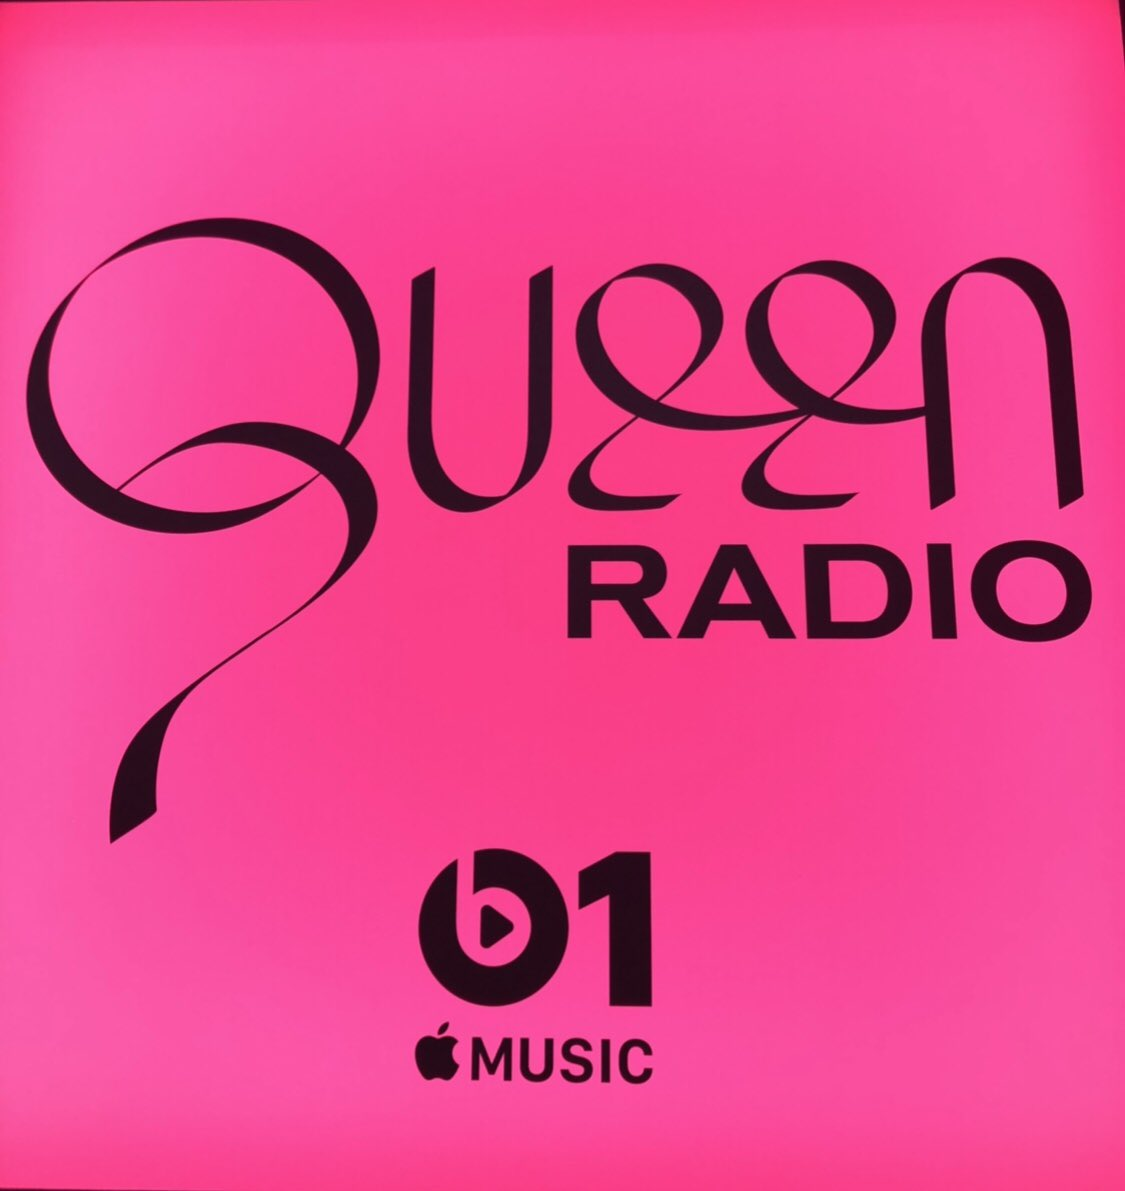 Tomorrow 5PM EST/2PM PST— #QueenRadio on Apple Music https://t.co/3wq7Vi3zZO